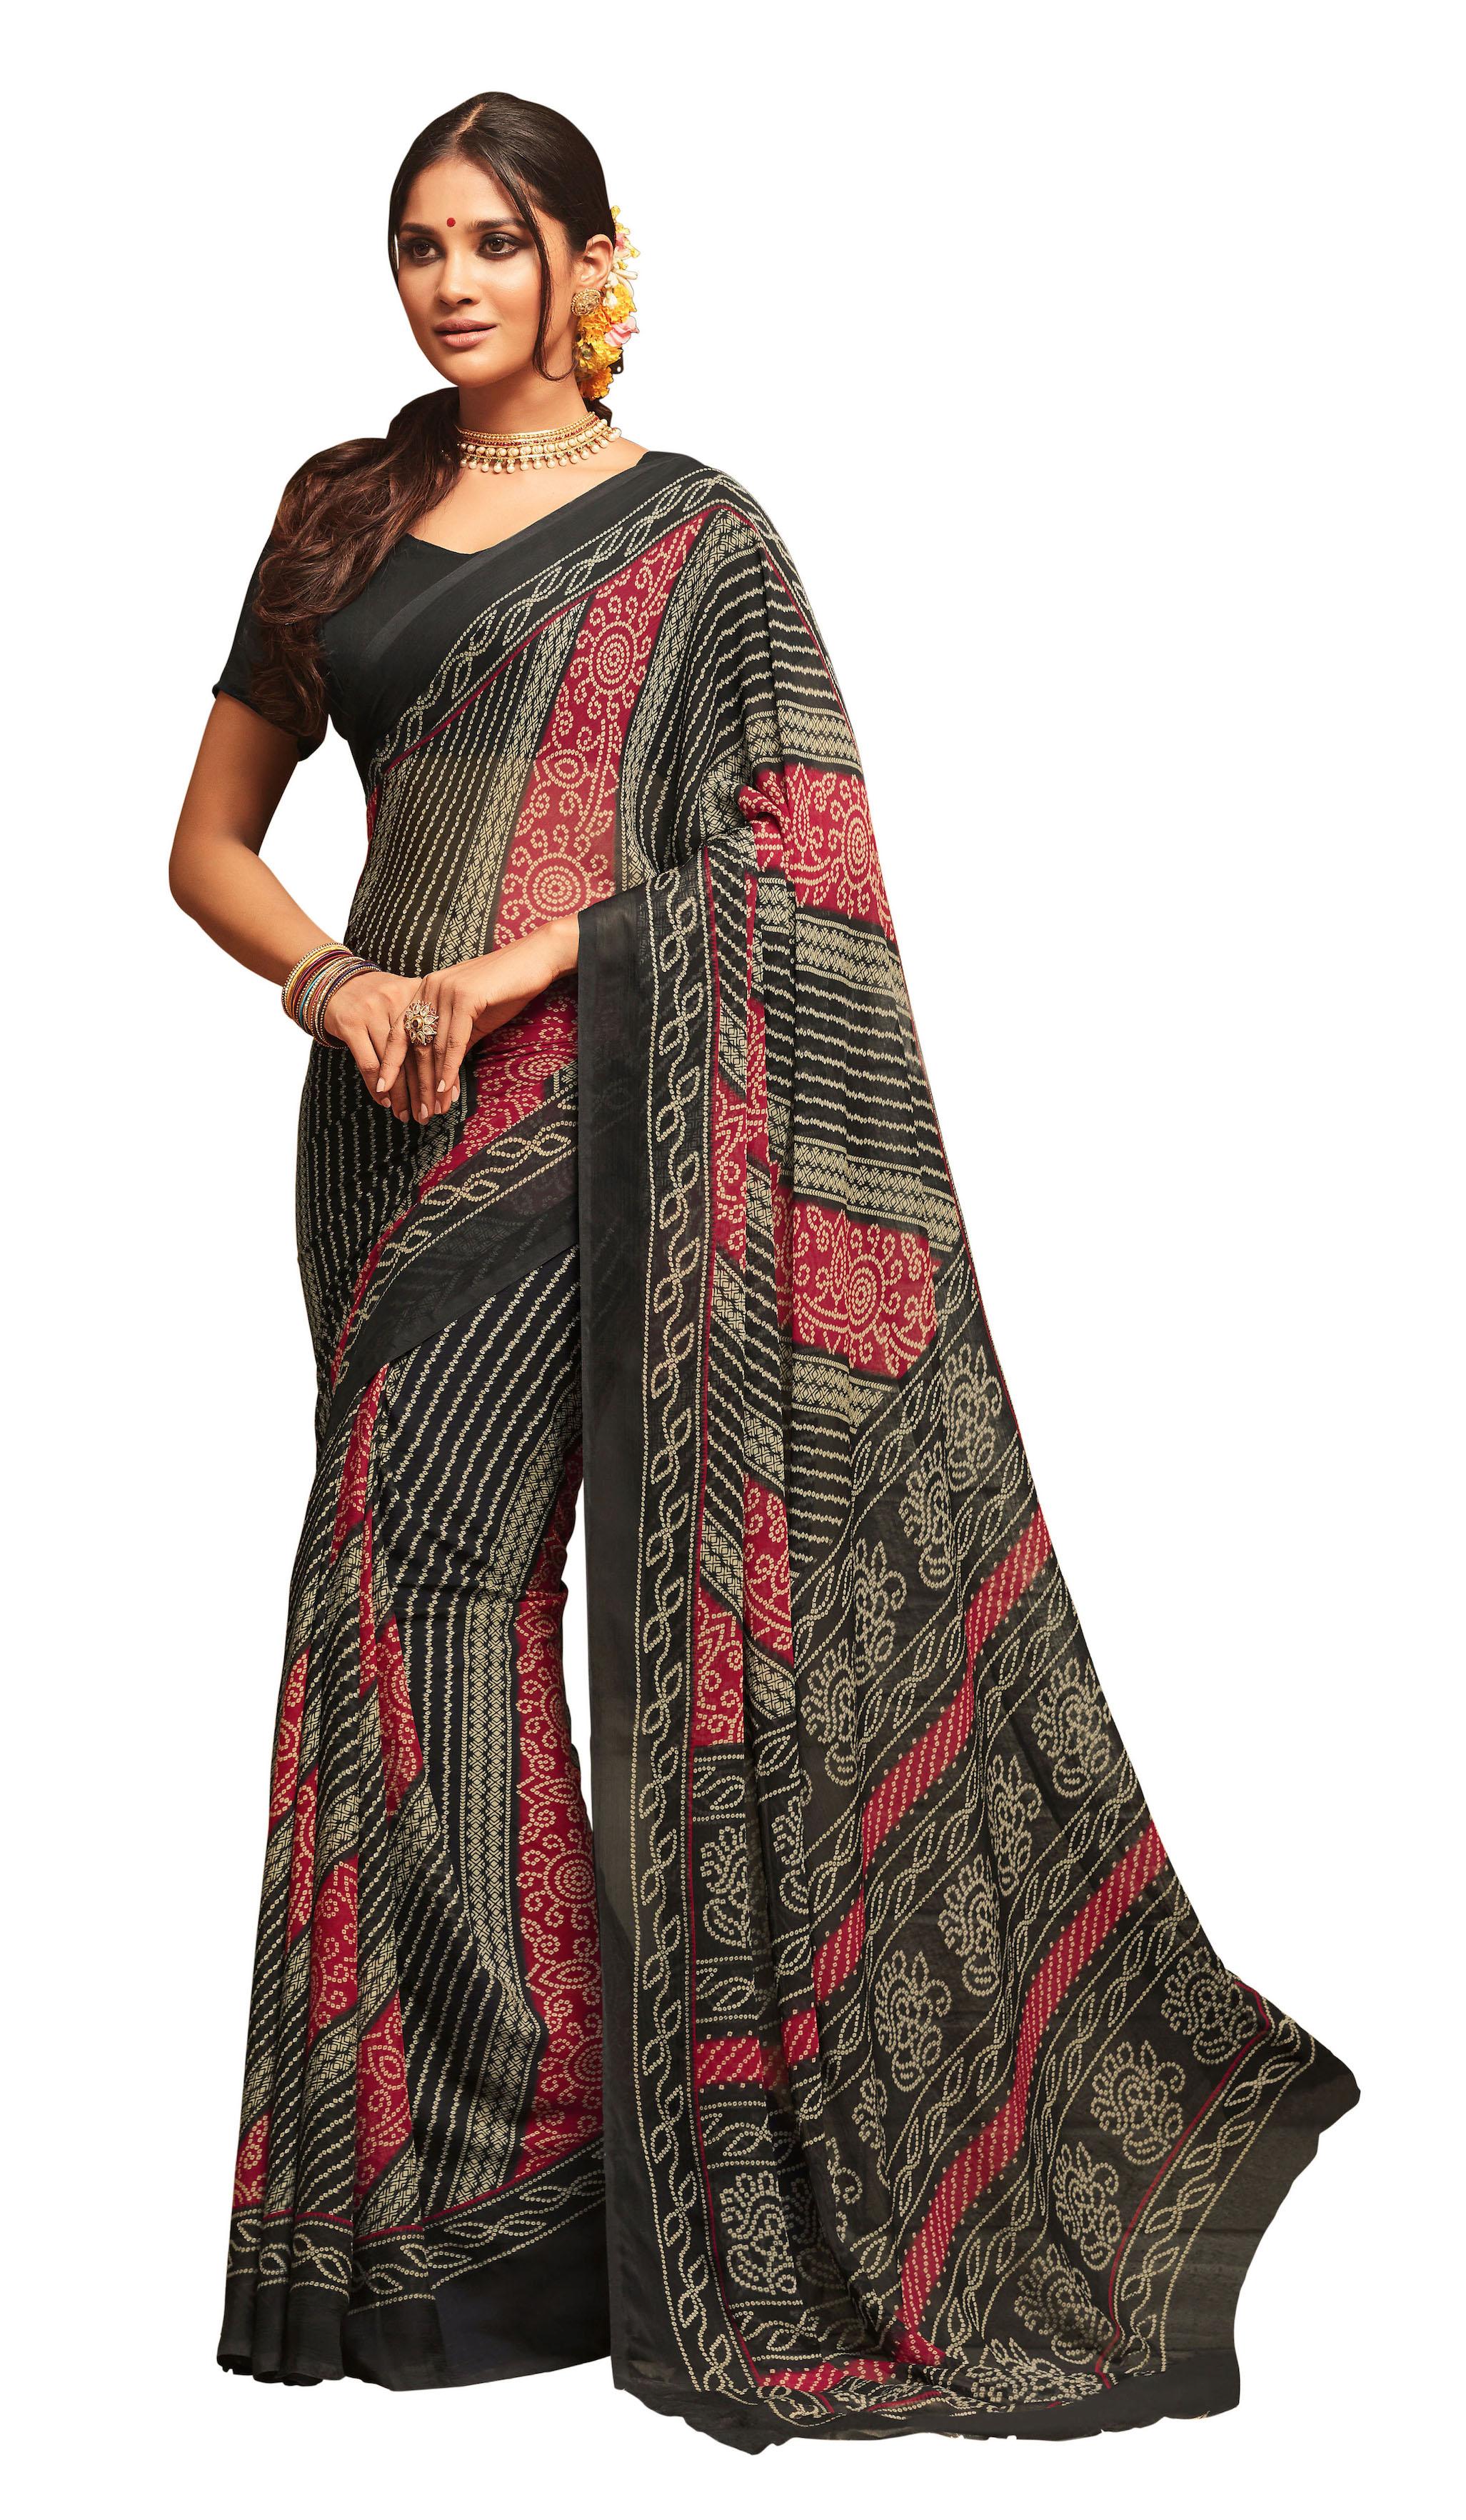 ae9ea2ff63 Black printed chiffon saree with blouse - Fashion House - 2667065